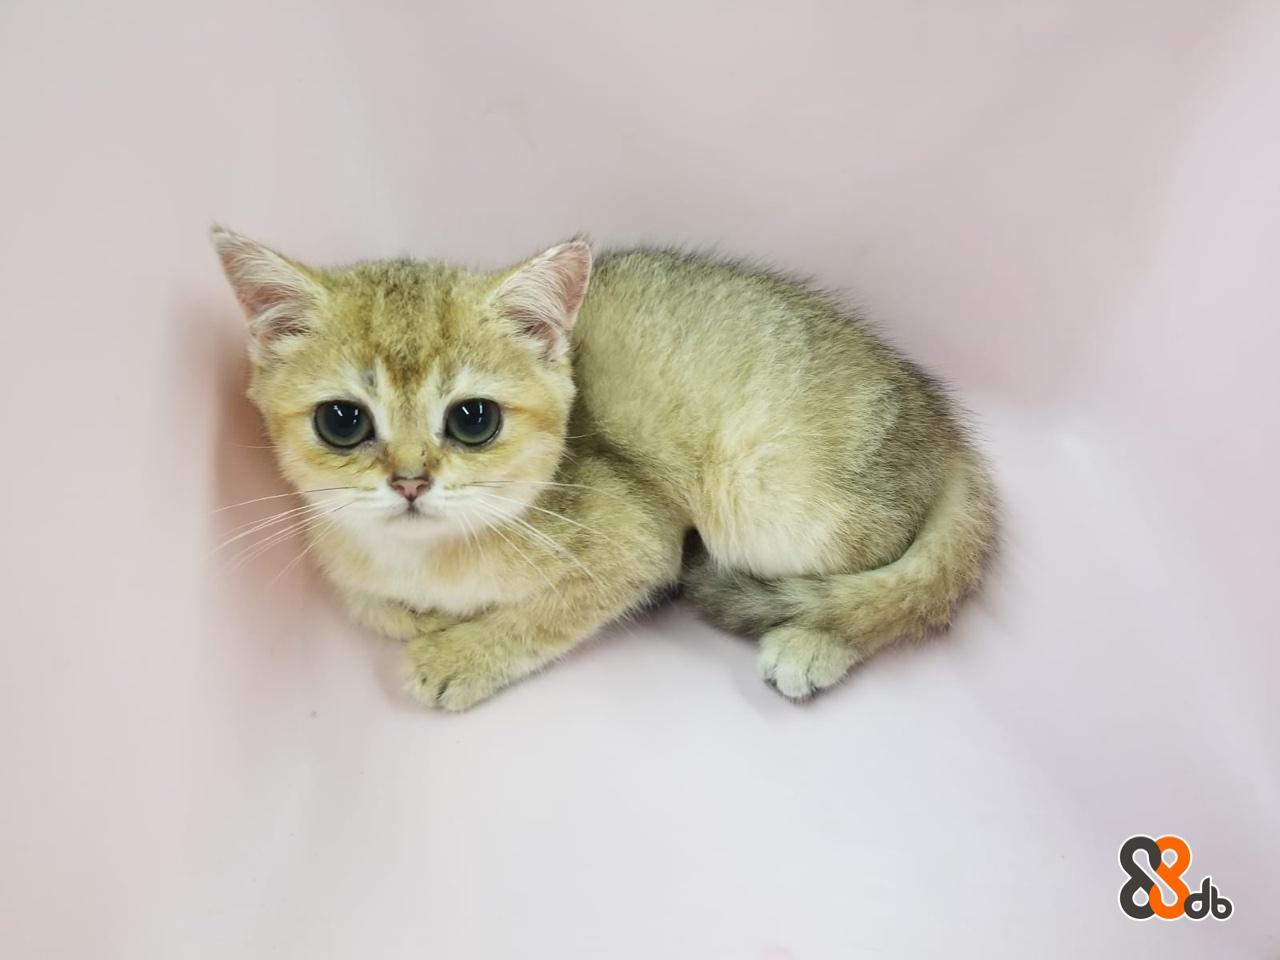 Cat,Small to medium-sized cats,Mammal,Felidae,Domestic short-haired cat